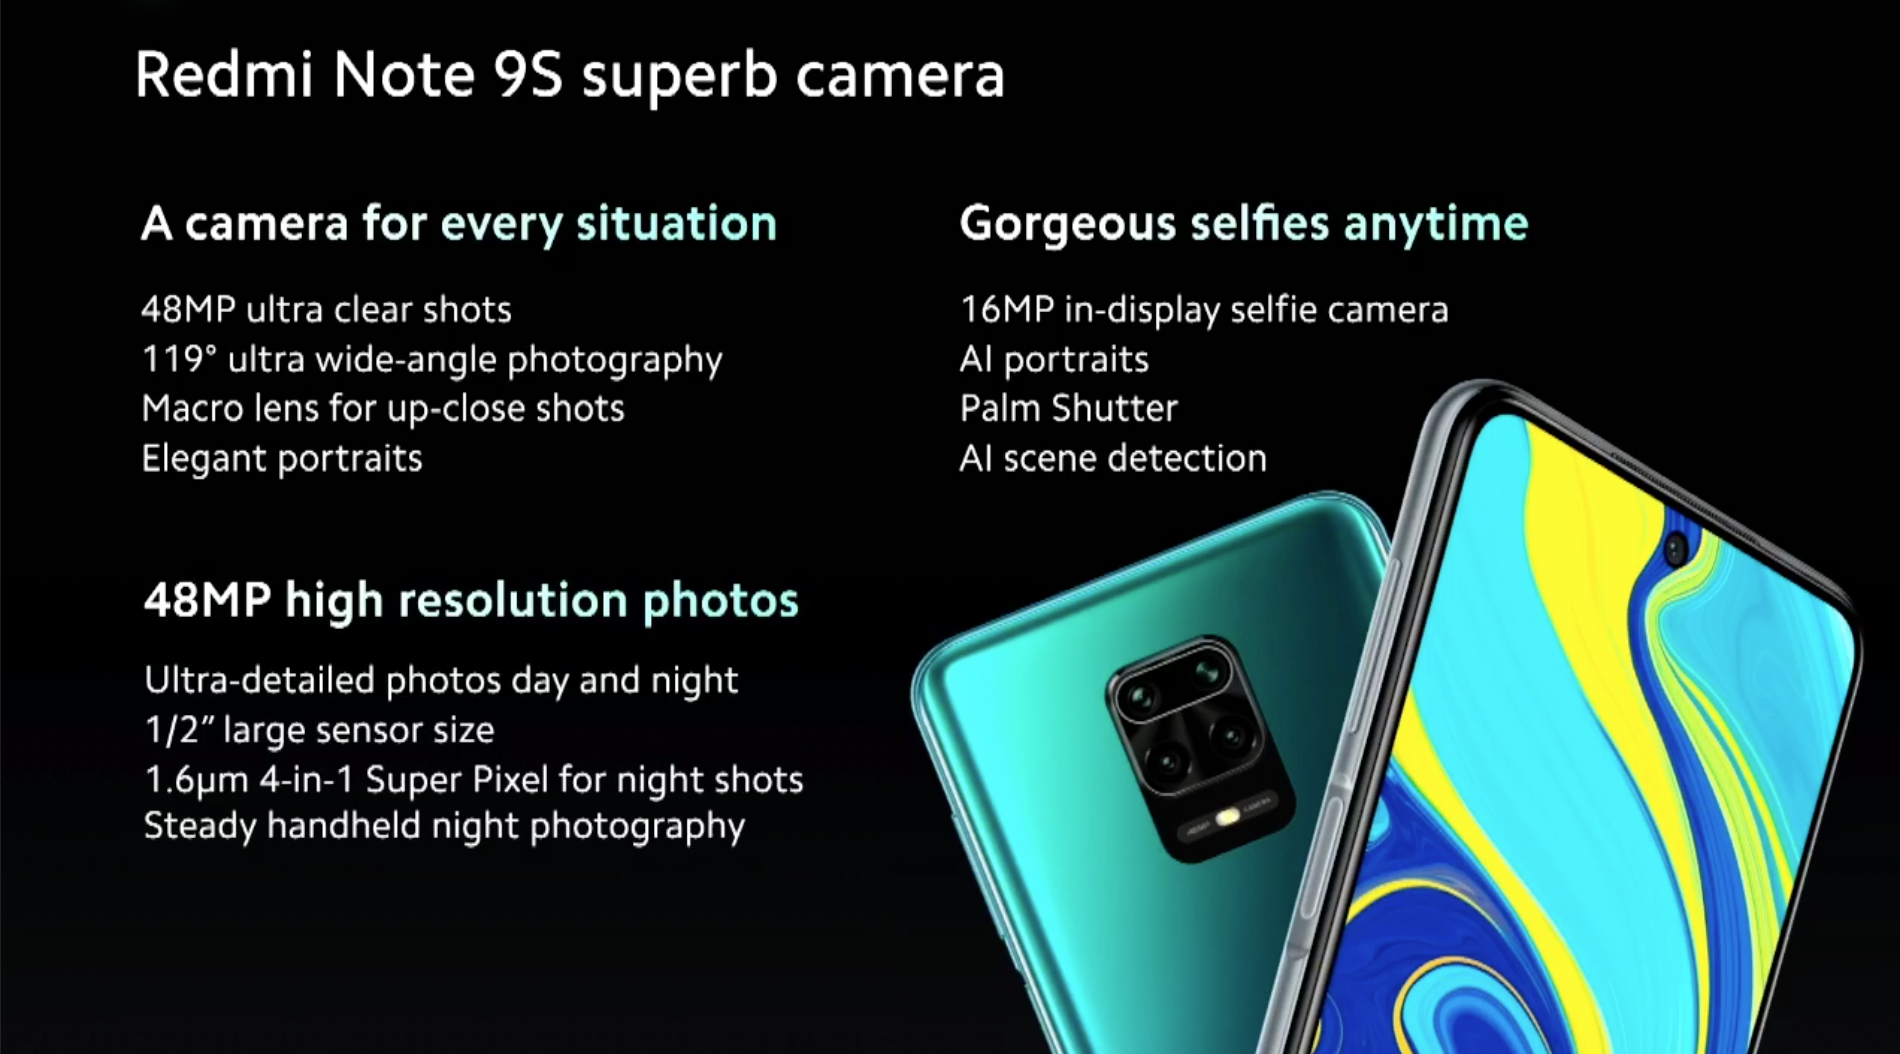 Redmi Note 9S fotocamera